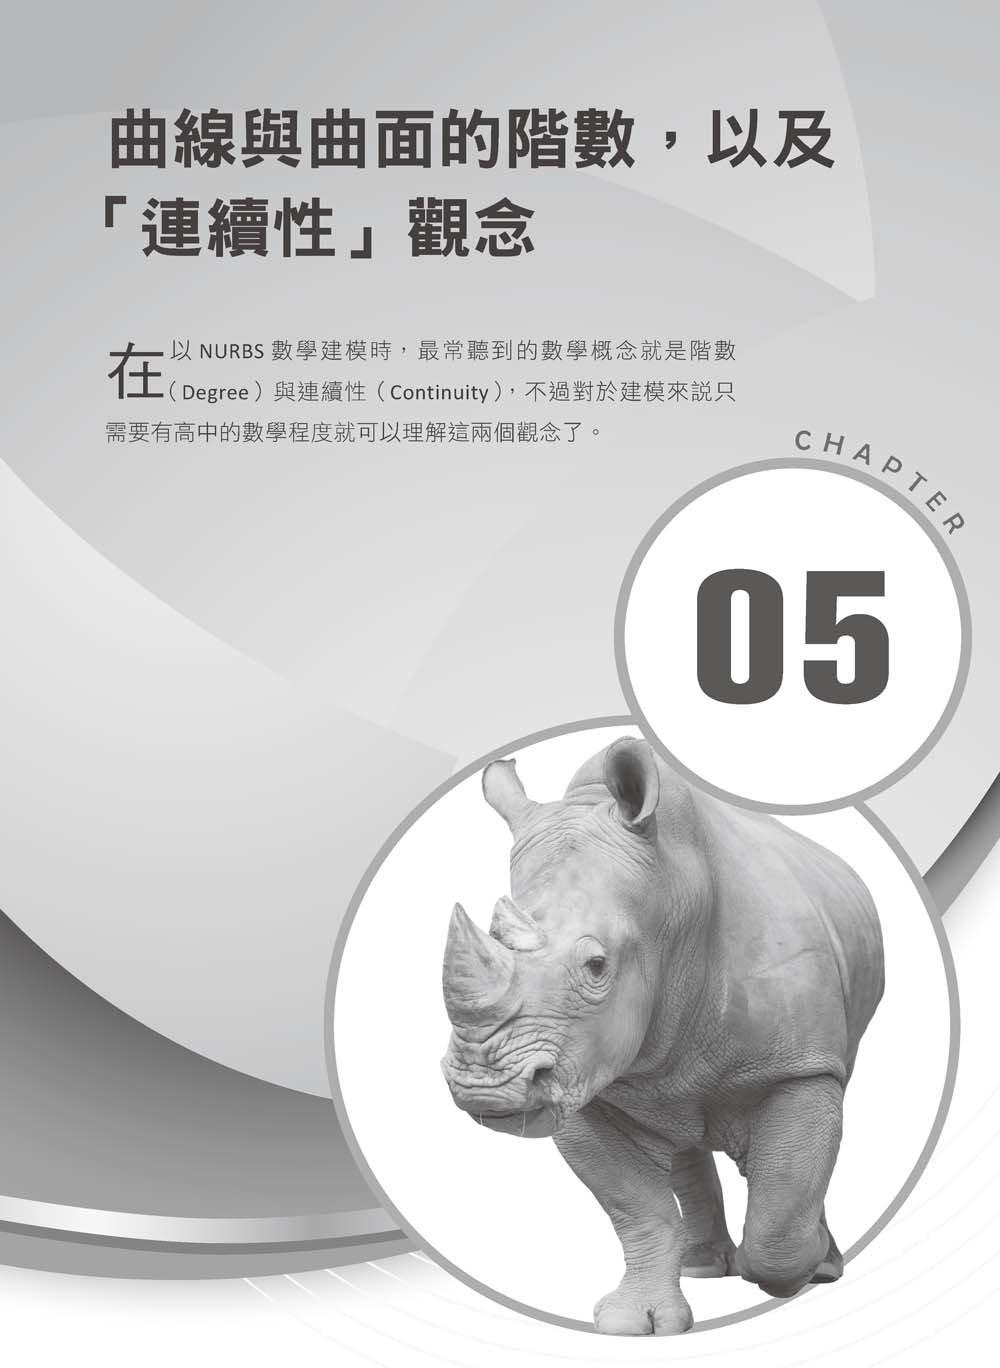 Rhinoceros 6 全攻略:自學設計與 3D建模寶典-preview-19